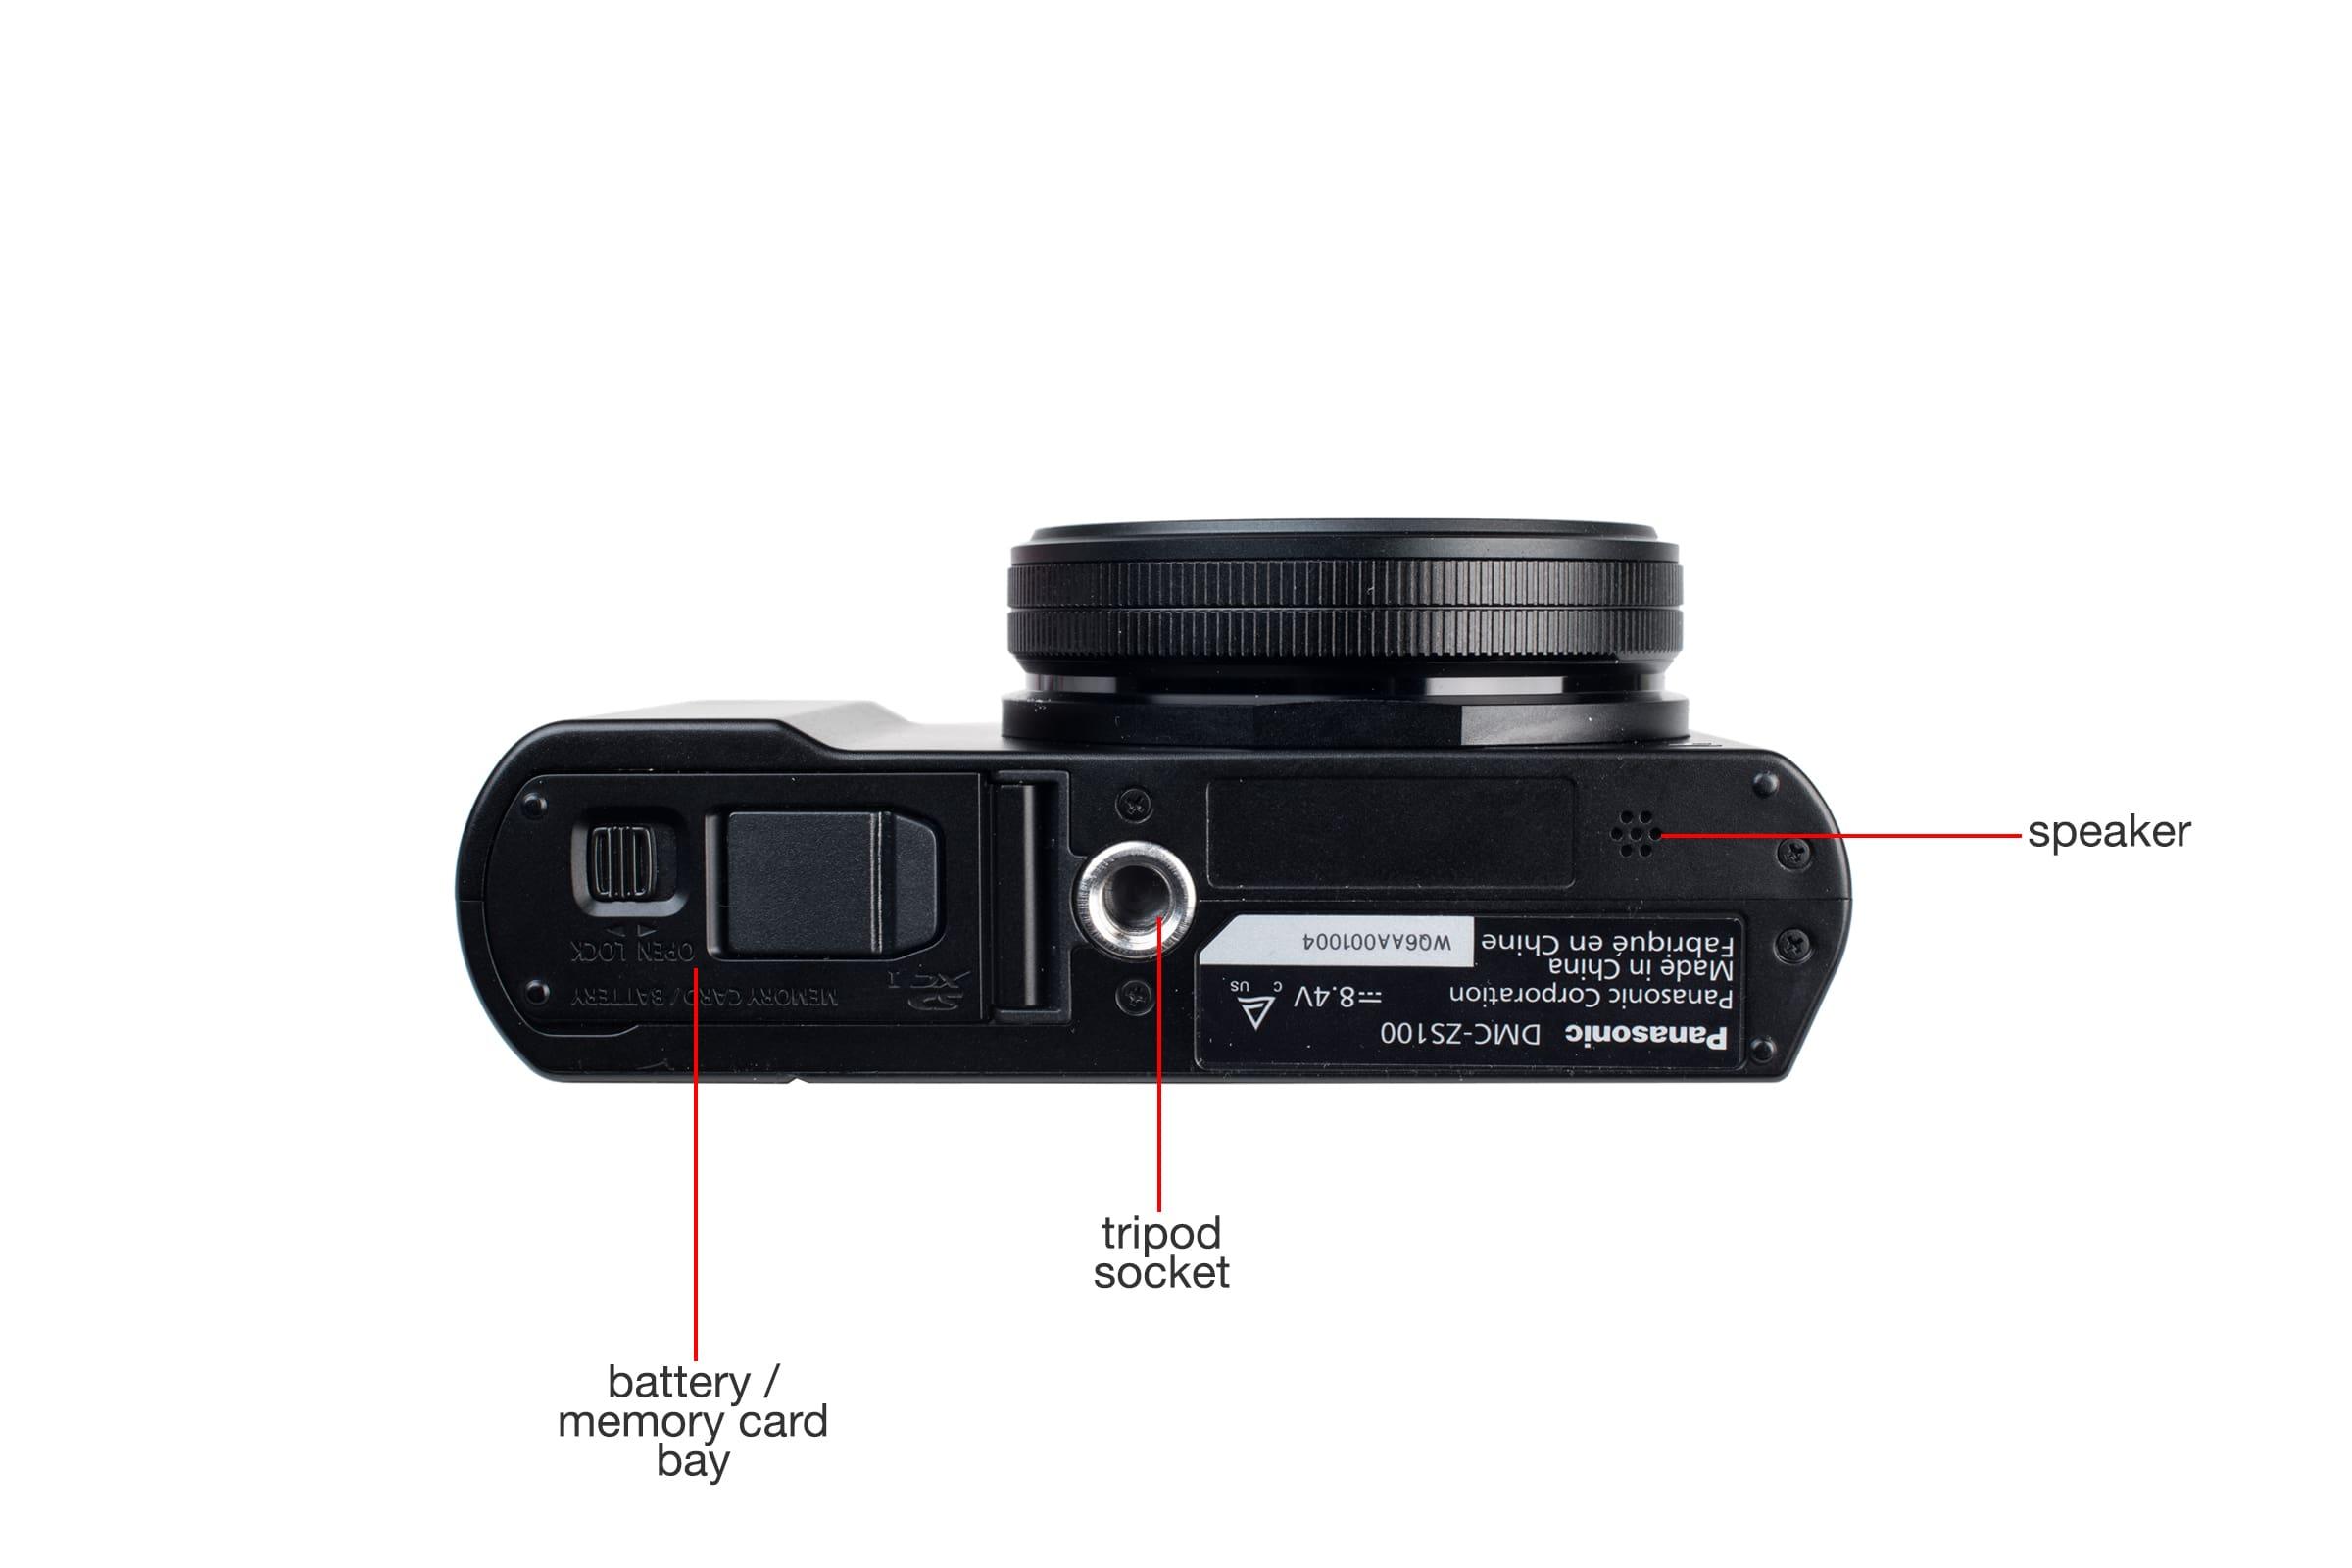 Bottom view of the Panasonic Lumix ZS100.